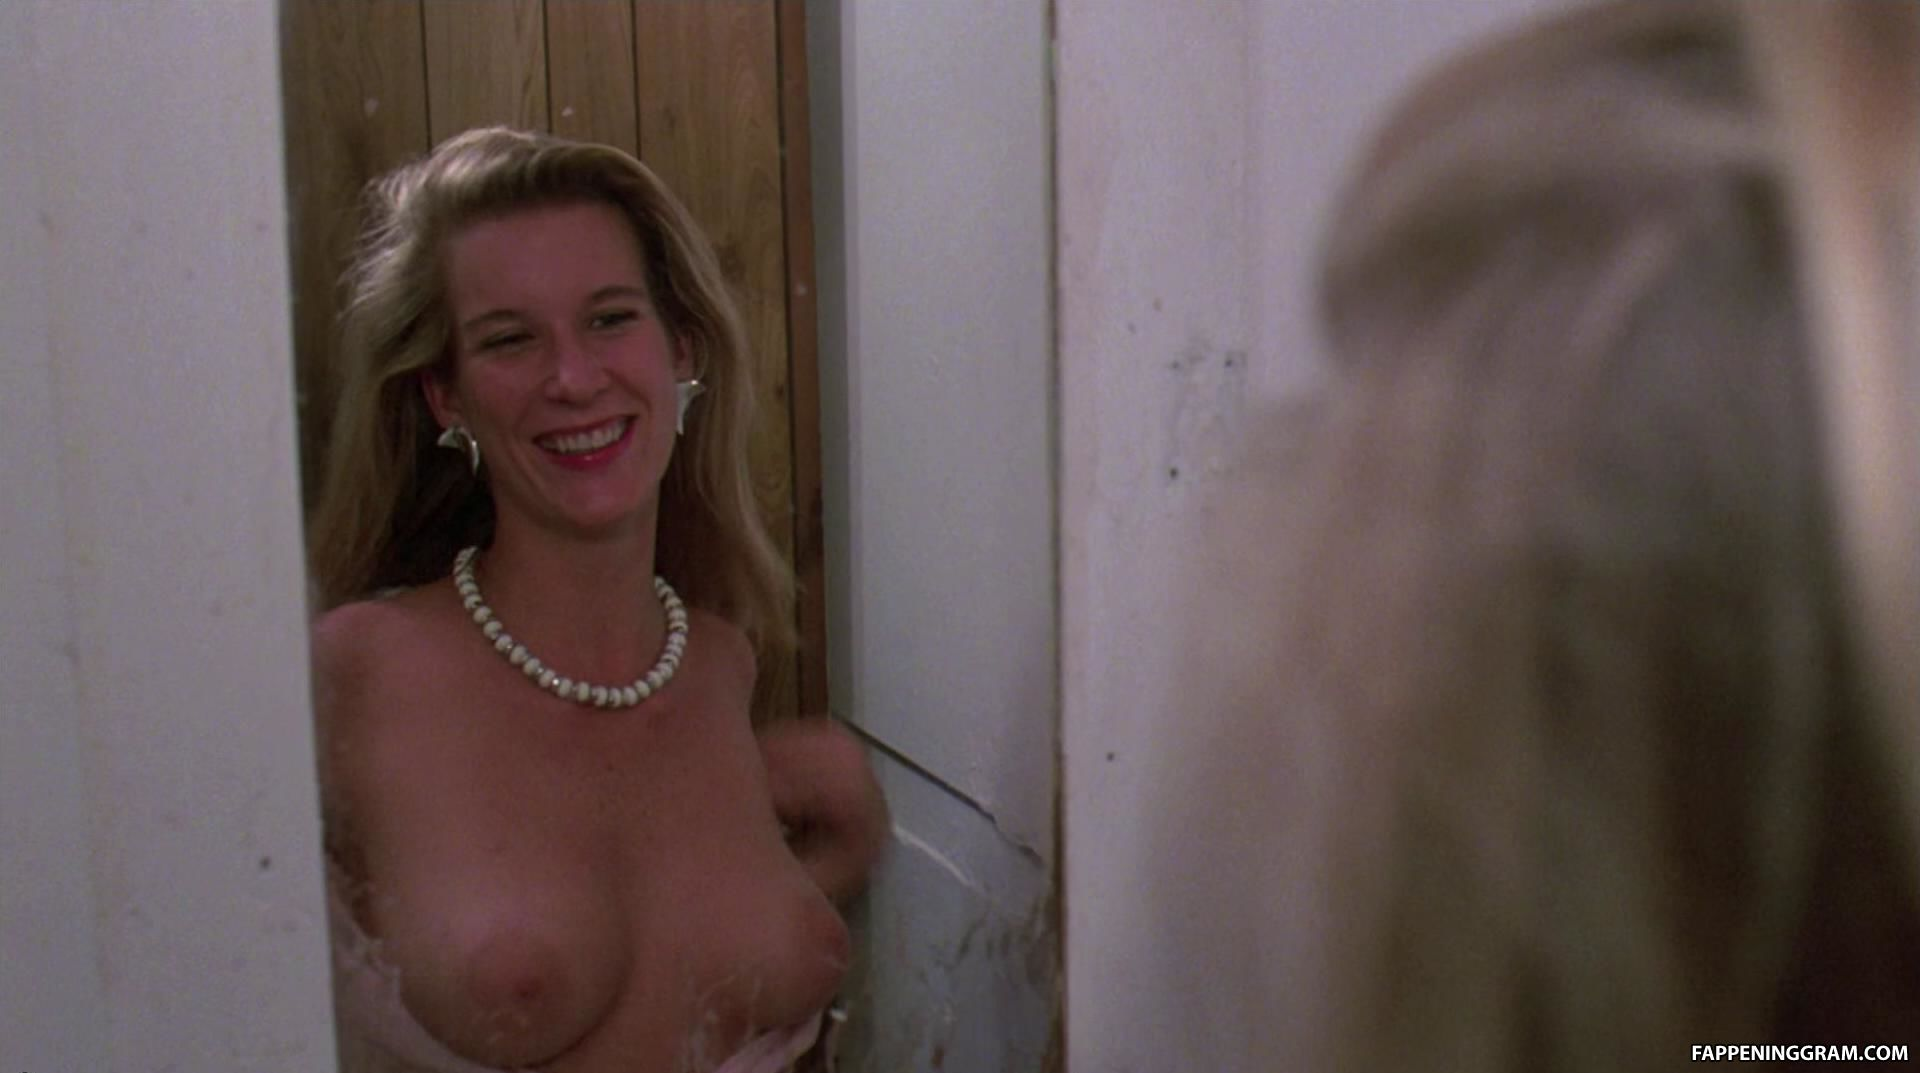 Doreen seidel nude